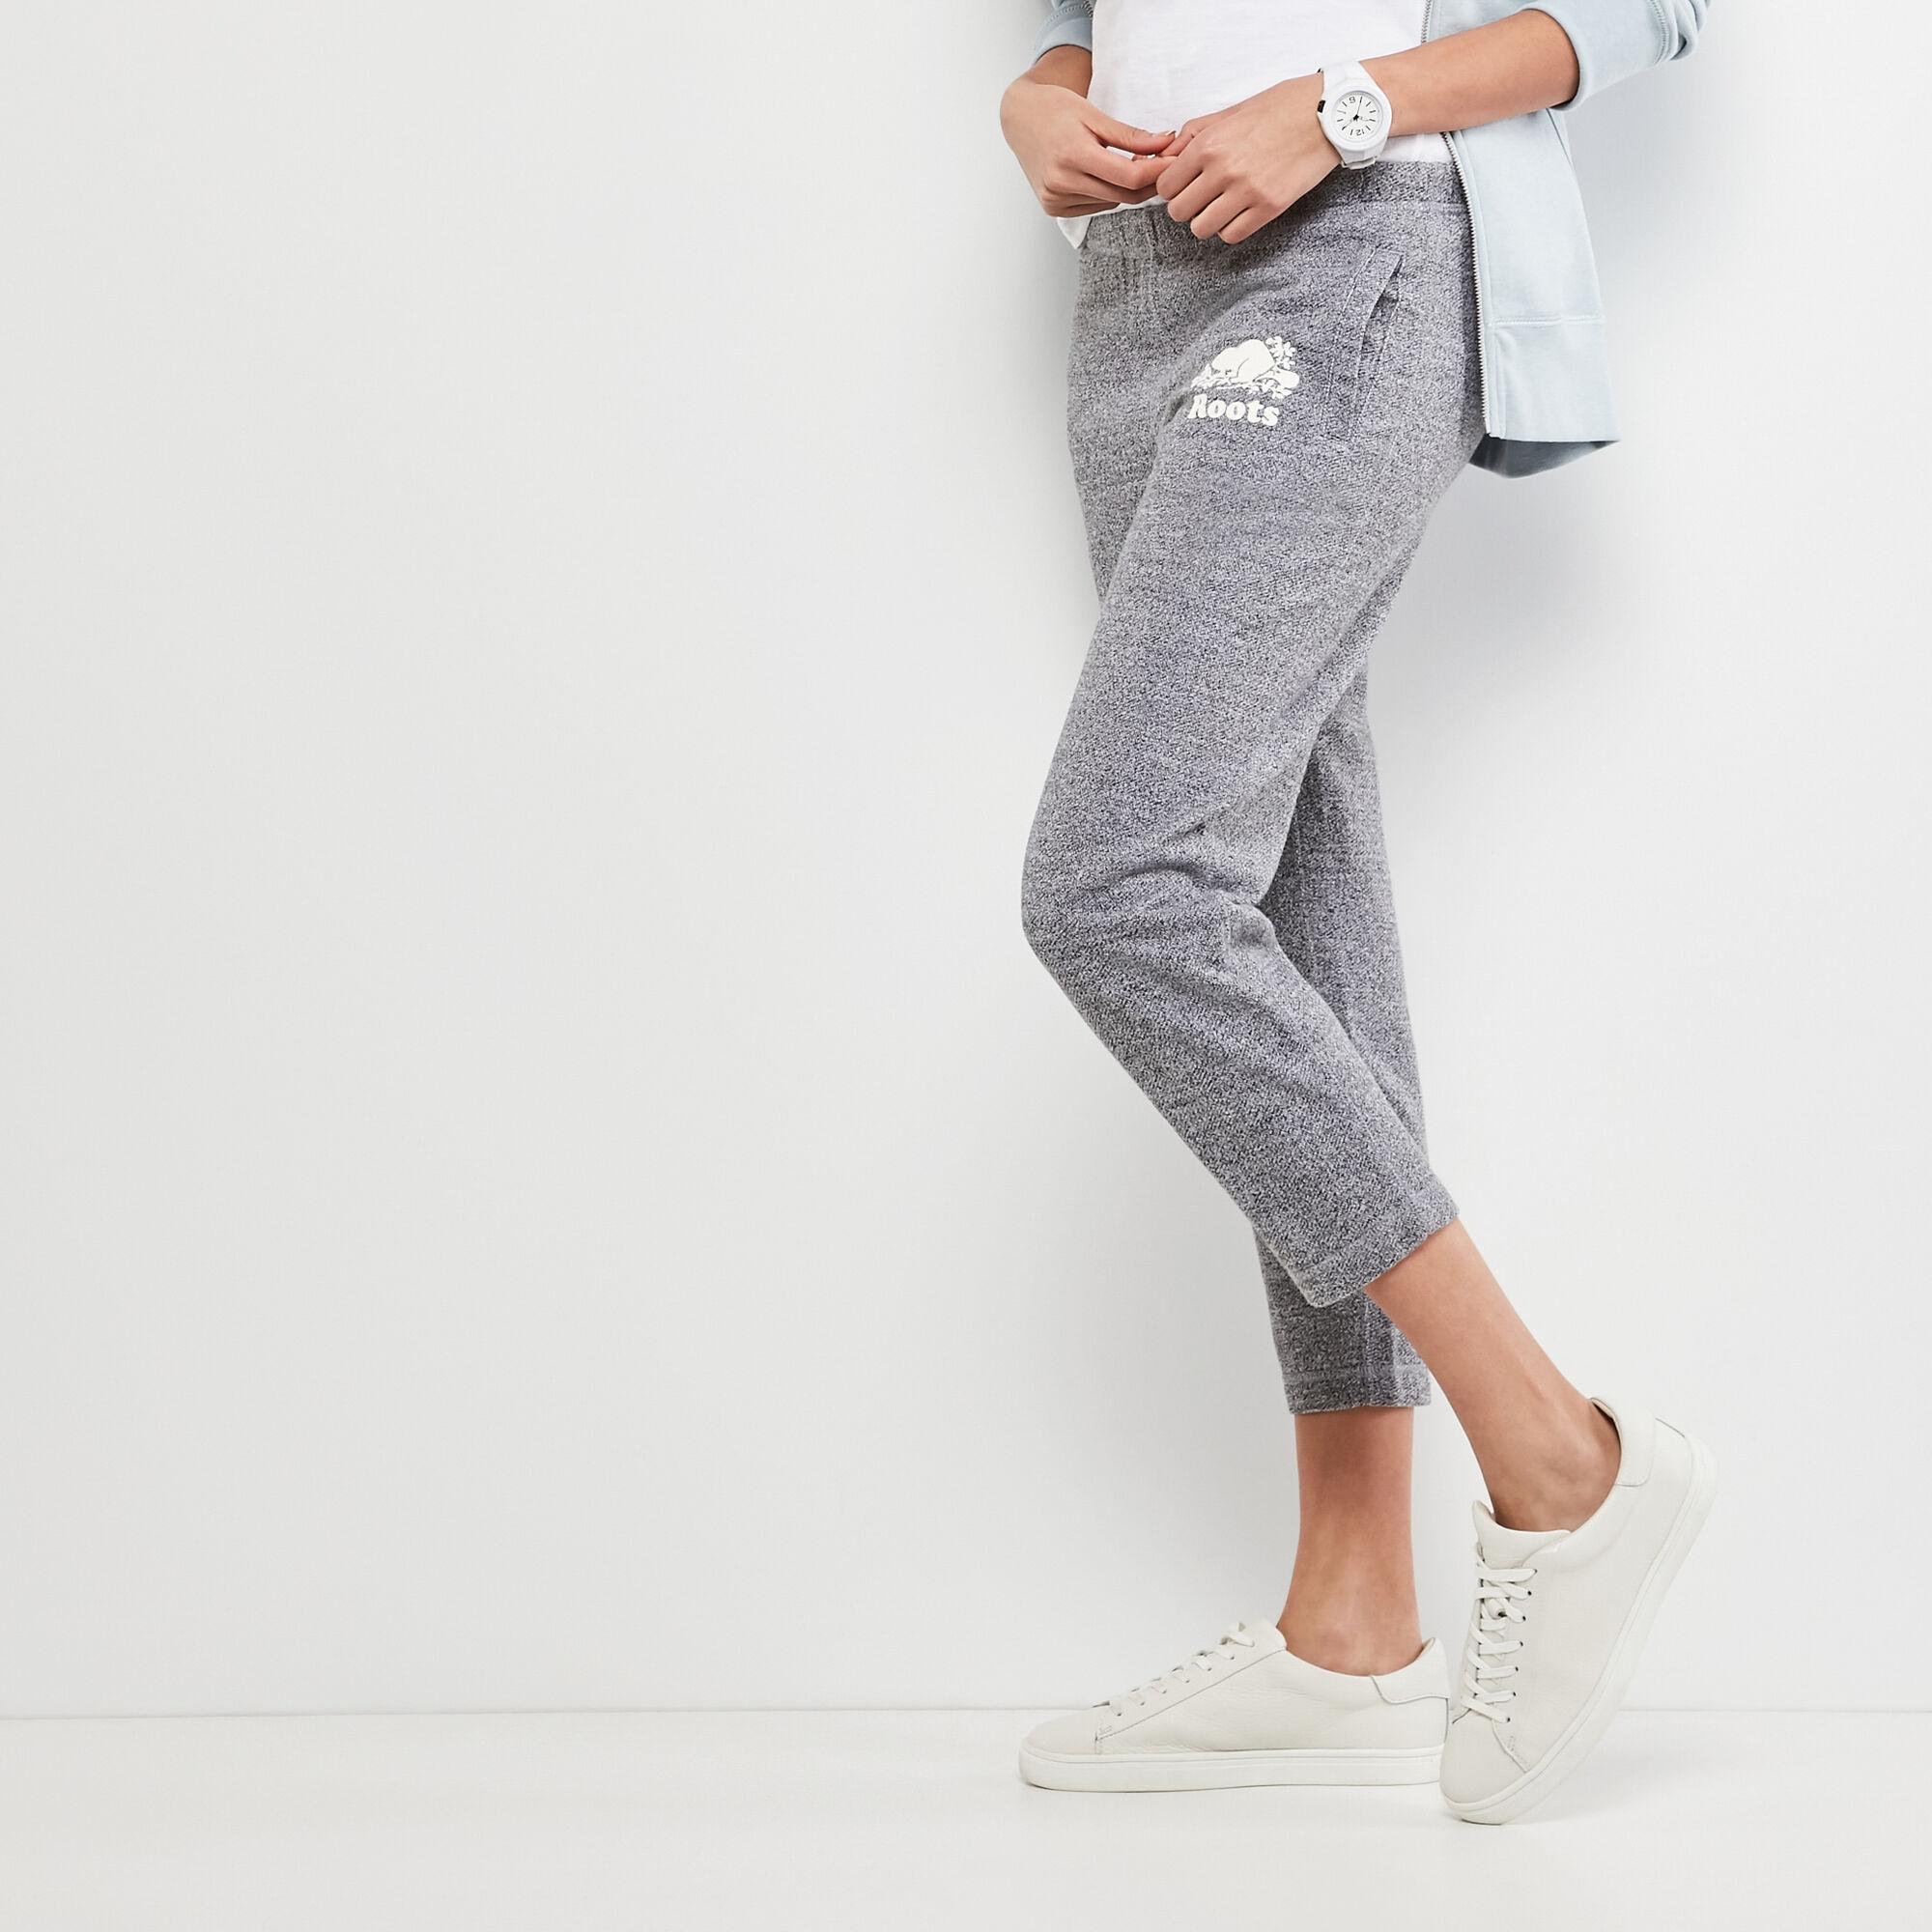 Pantalon Co Cheville Original